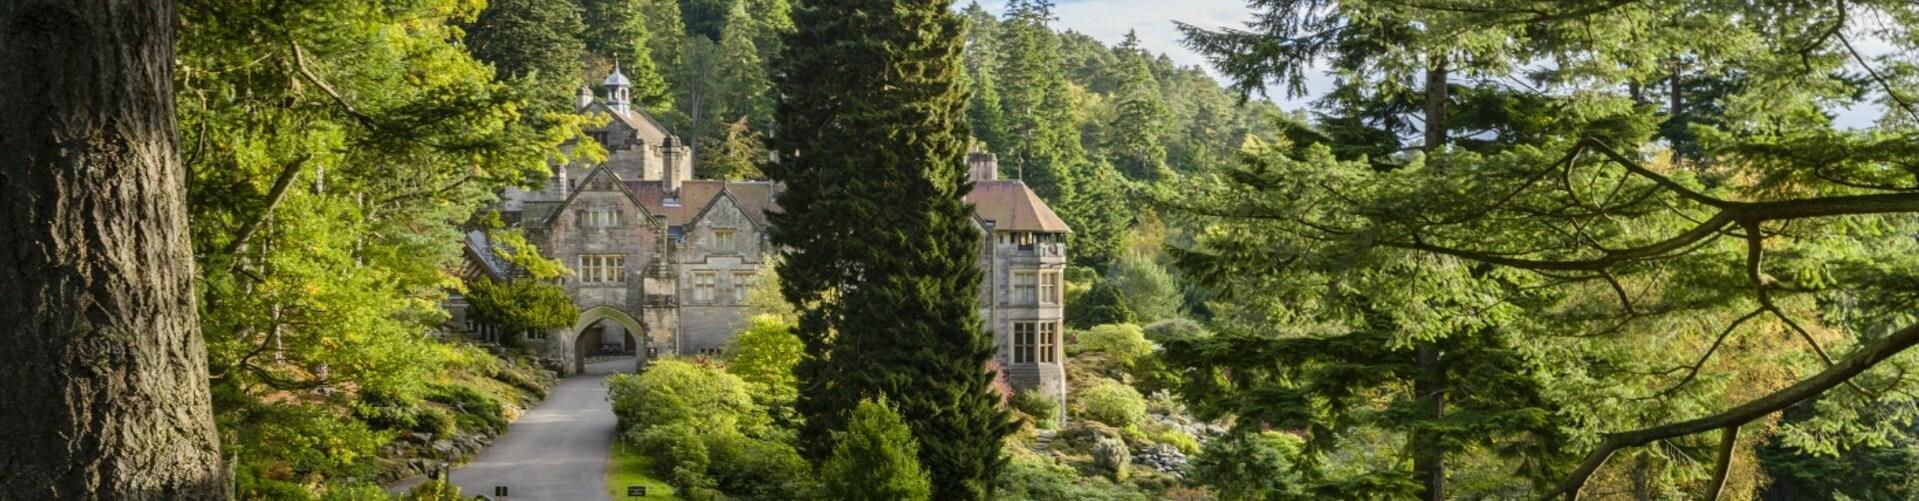 Cragside National Trust HERO Resized DC